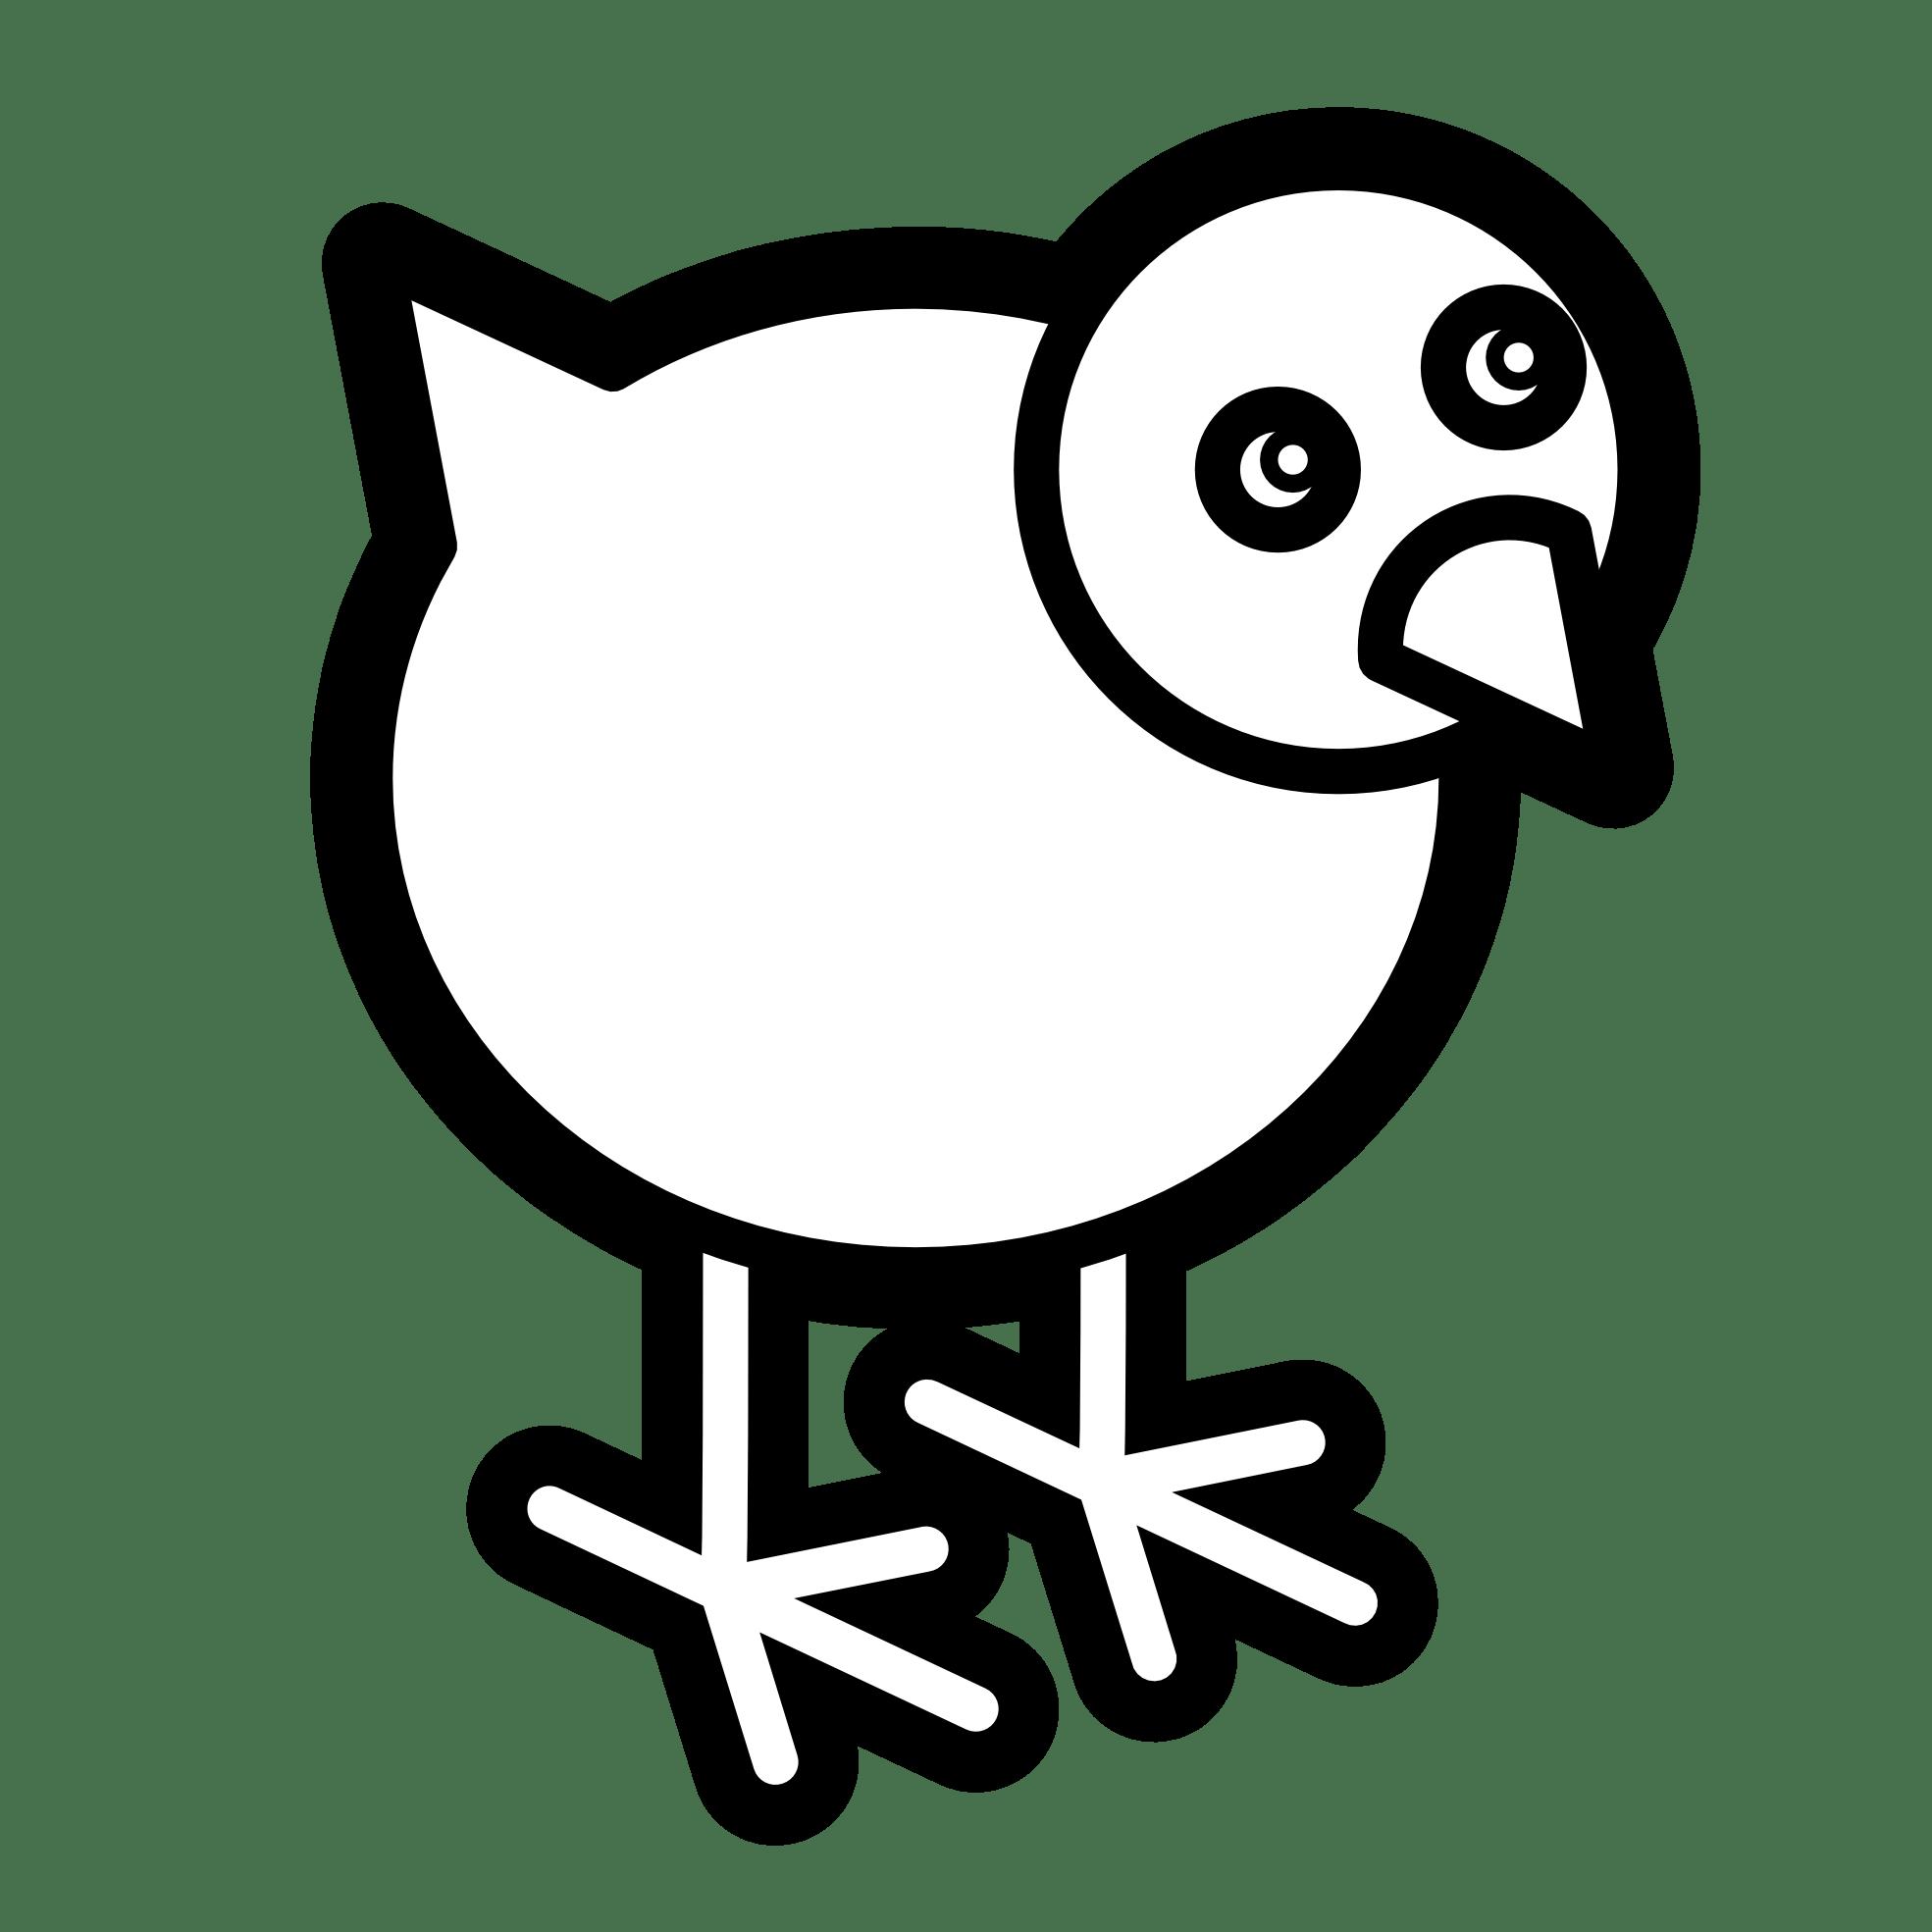 Chicken Egg Clipart Black And White Clipart Panda